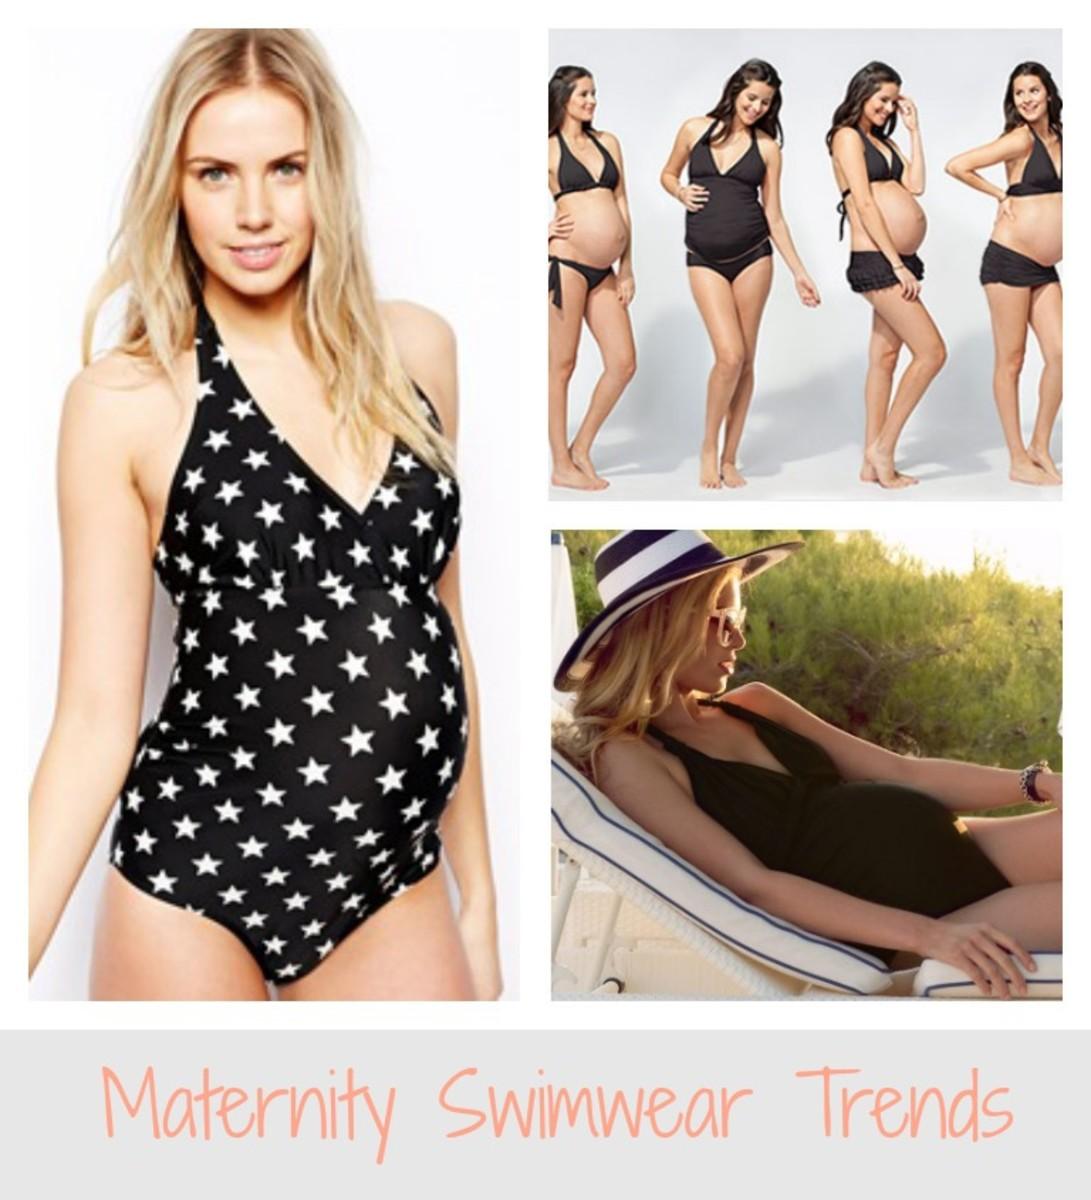 Maternity Swimwear Trends.jpg.jpg